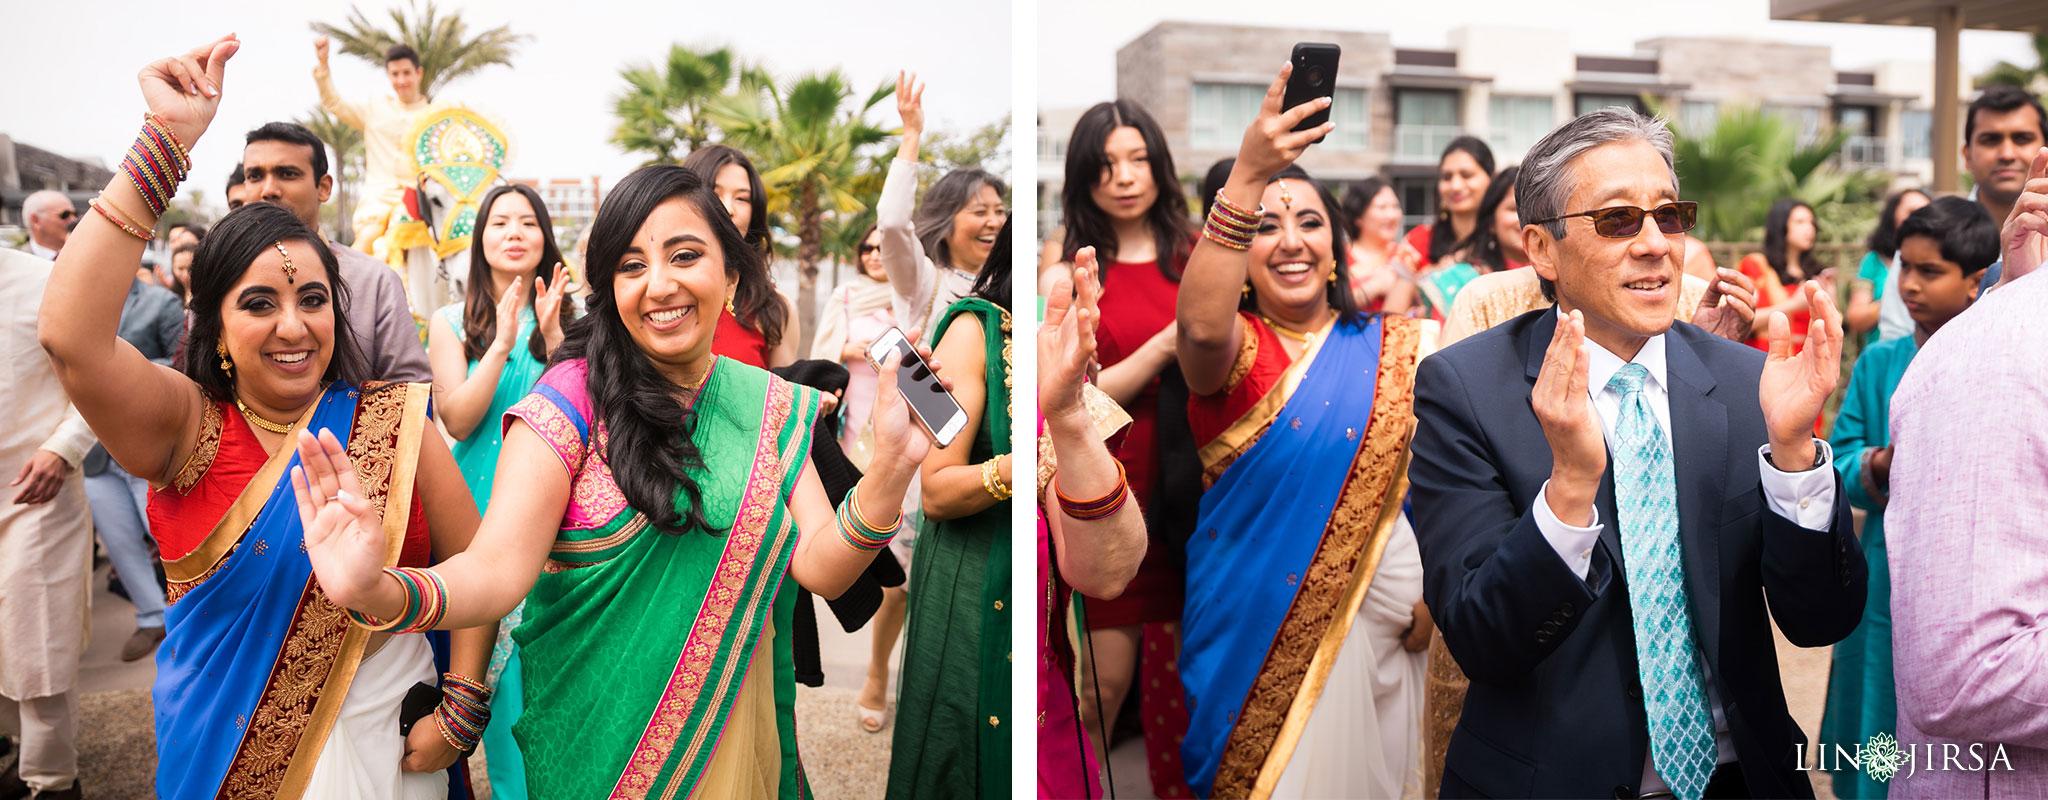 17 pasea hotel and spa huntington beach indian wedding baraat photography